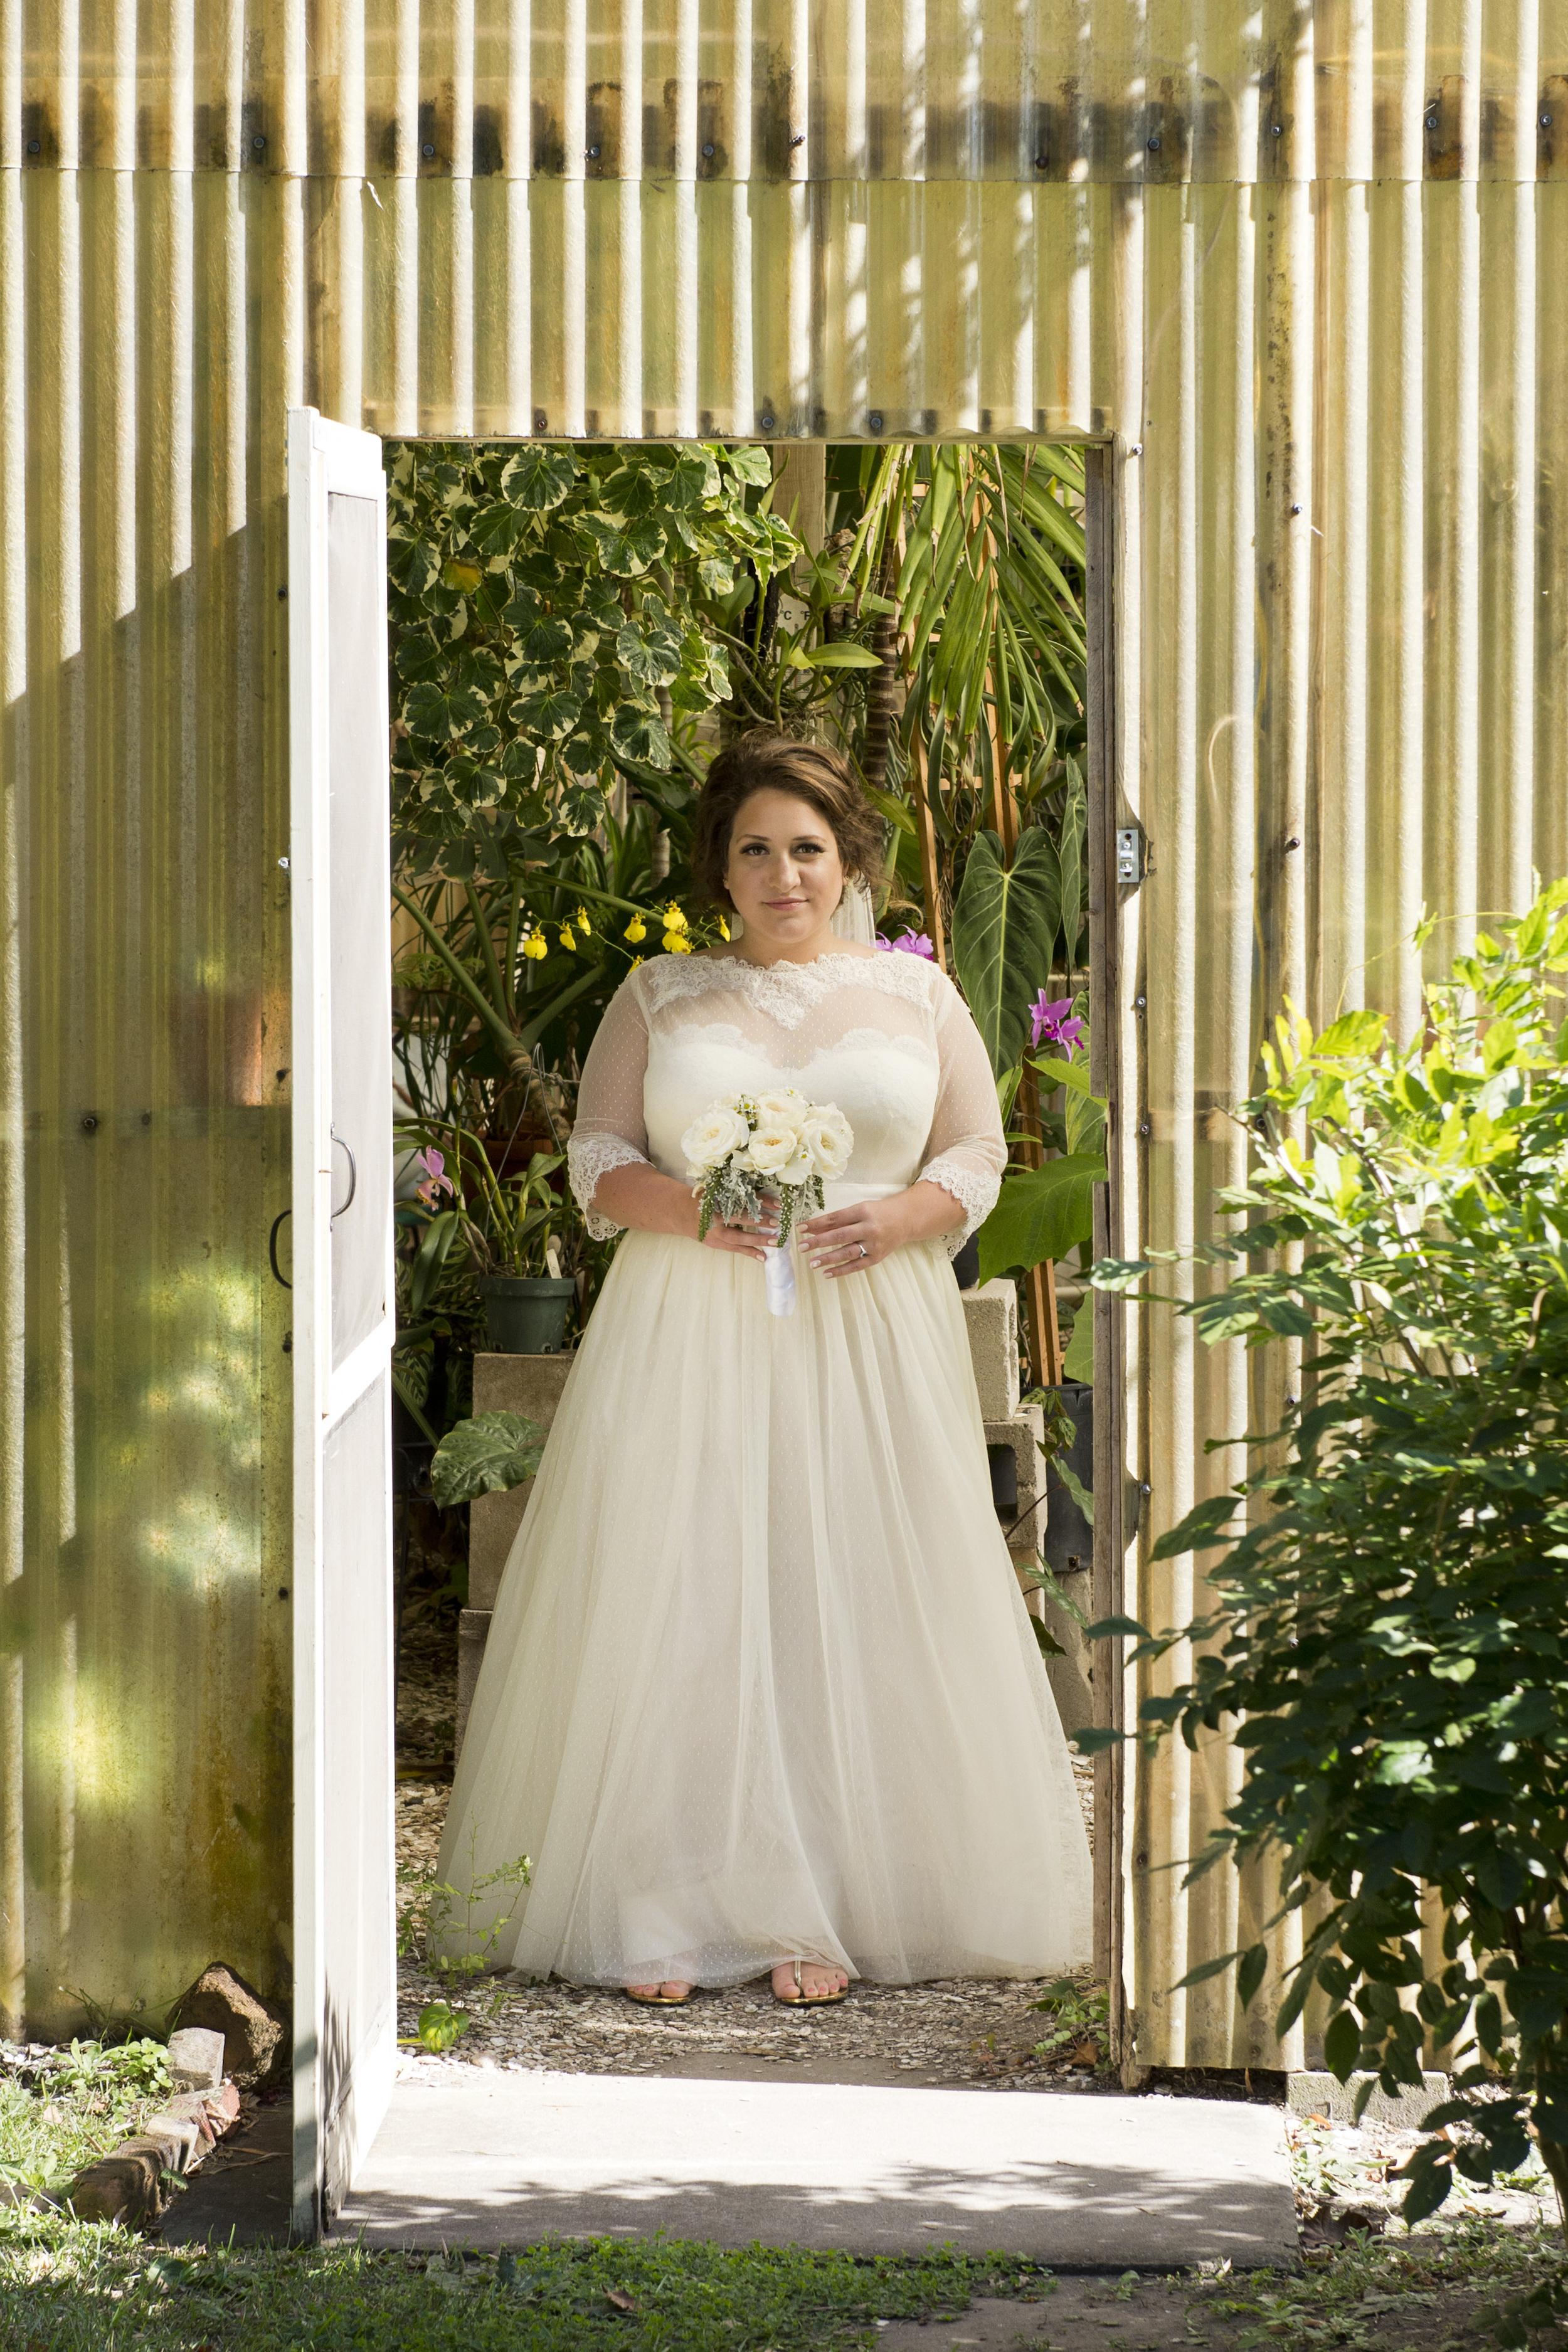 Caroline-Kilgore-photography-ivory-and-beau-bridal-boutique-savannah-wedding-dresses-savannah-bridal-boutique-savannah-wedding-gowns-custom-wedding-dress-vintage-wedding-dress-swiss-dot-wedding-dress-shrimp-boat-wedding-10.jpg